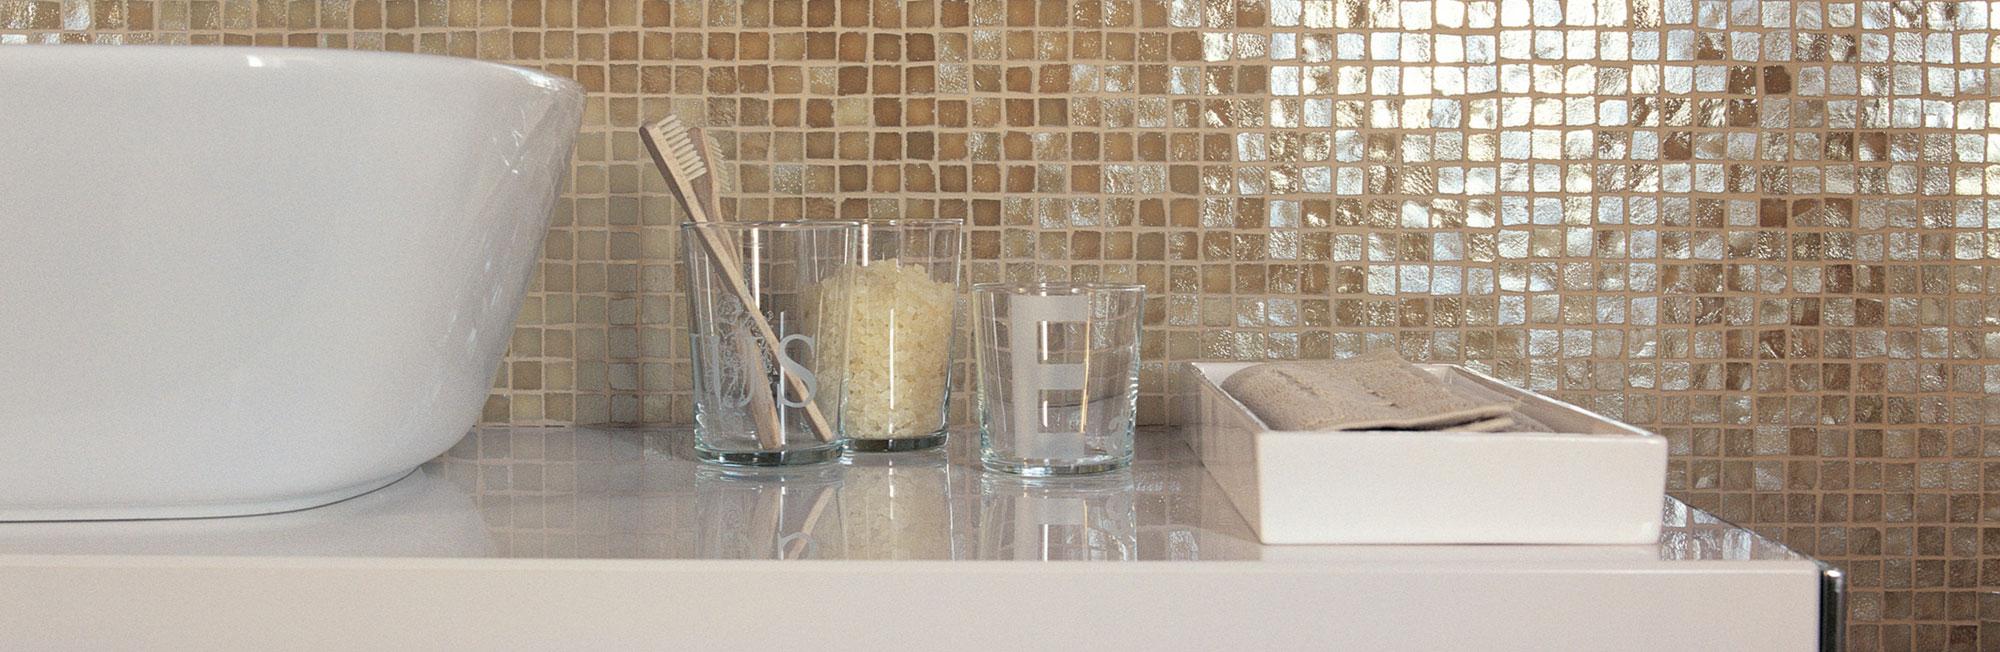 Carrelage et salle de bains suresnes paris casa calvi for Showroom carrelage paris